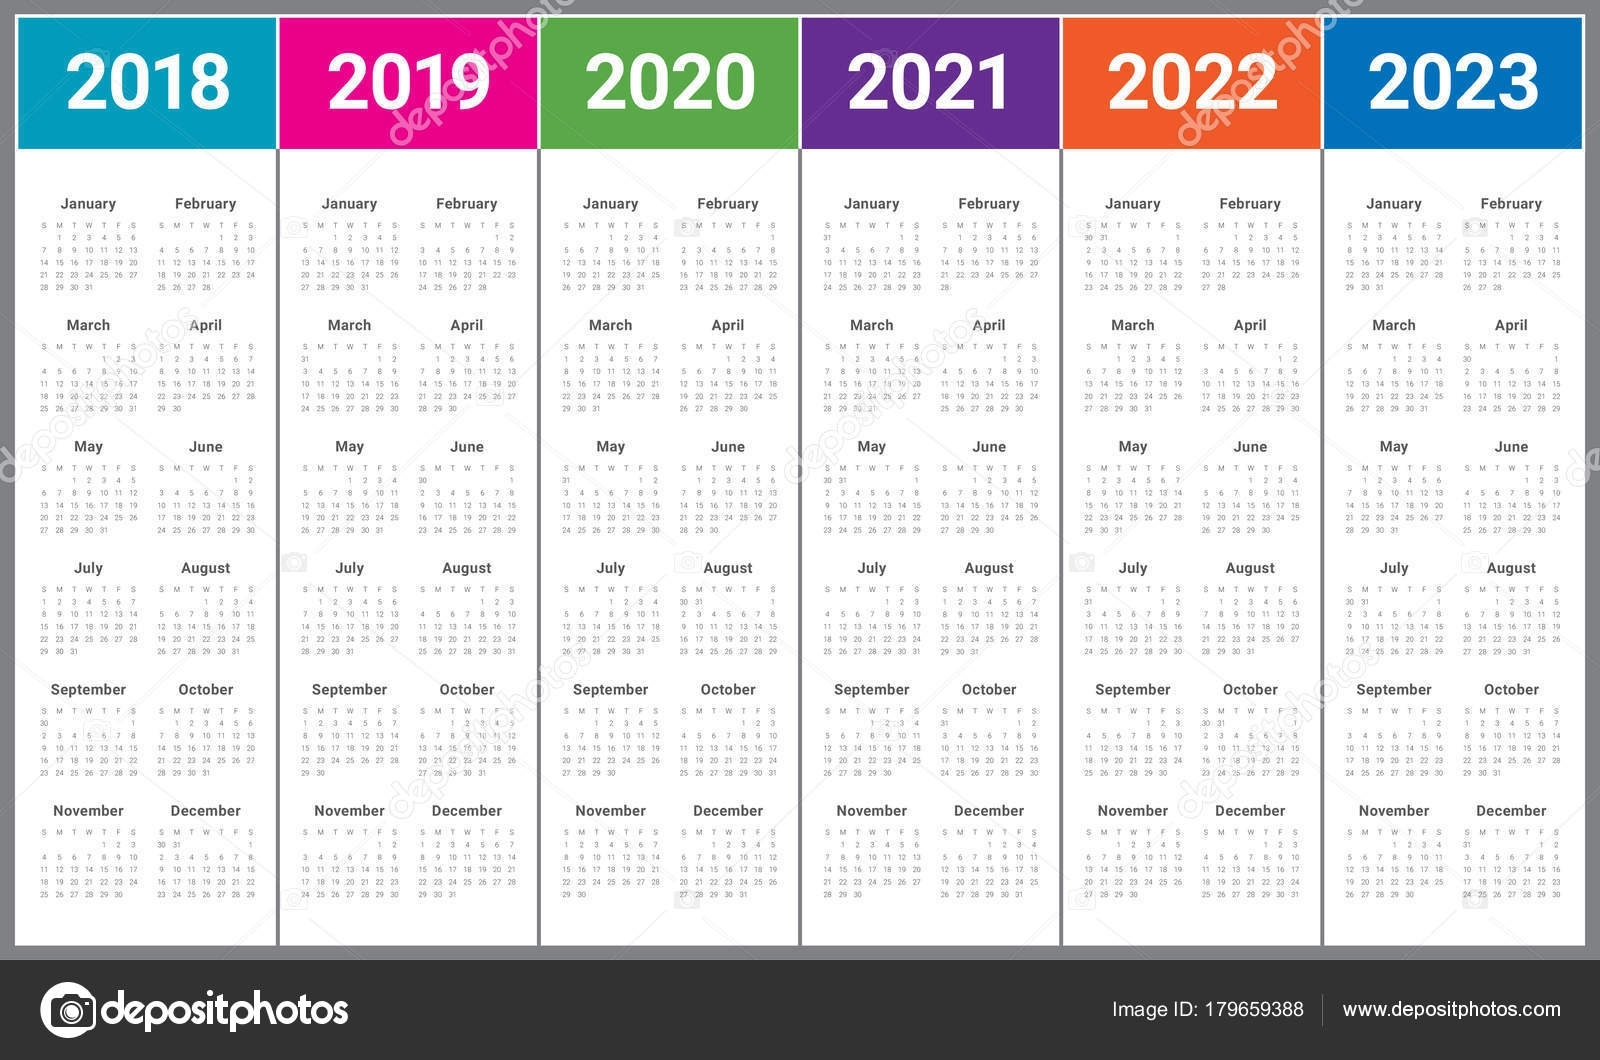 Year 2018 2019 2020 2021 2022 2023 Calendar Vector — Stock Vector intended for Calendar Yearly 2019 2020 2021